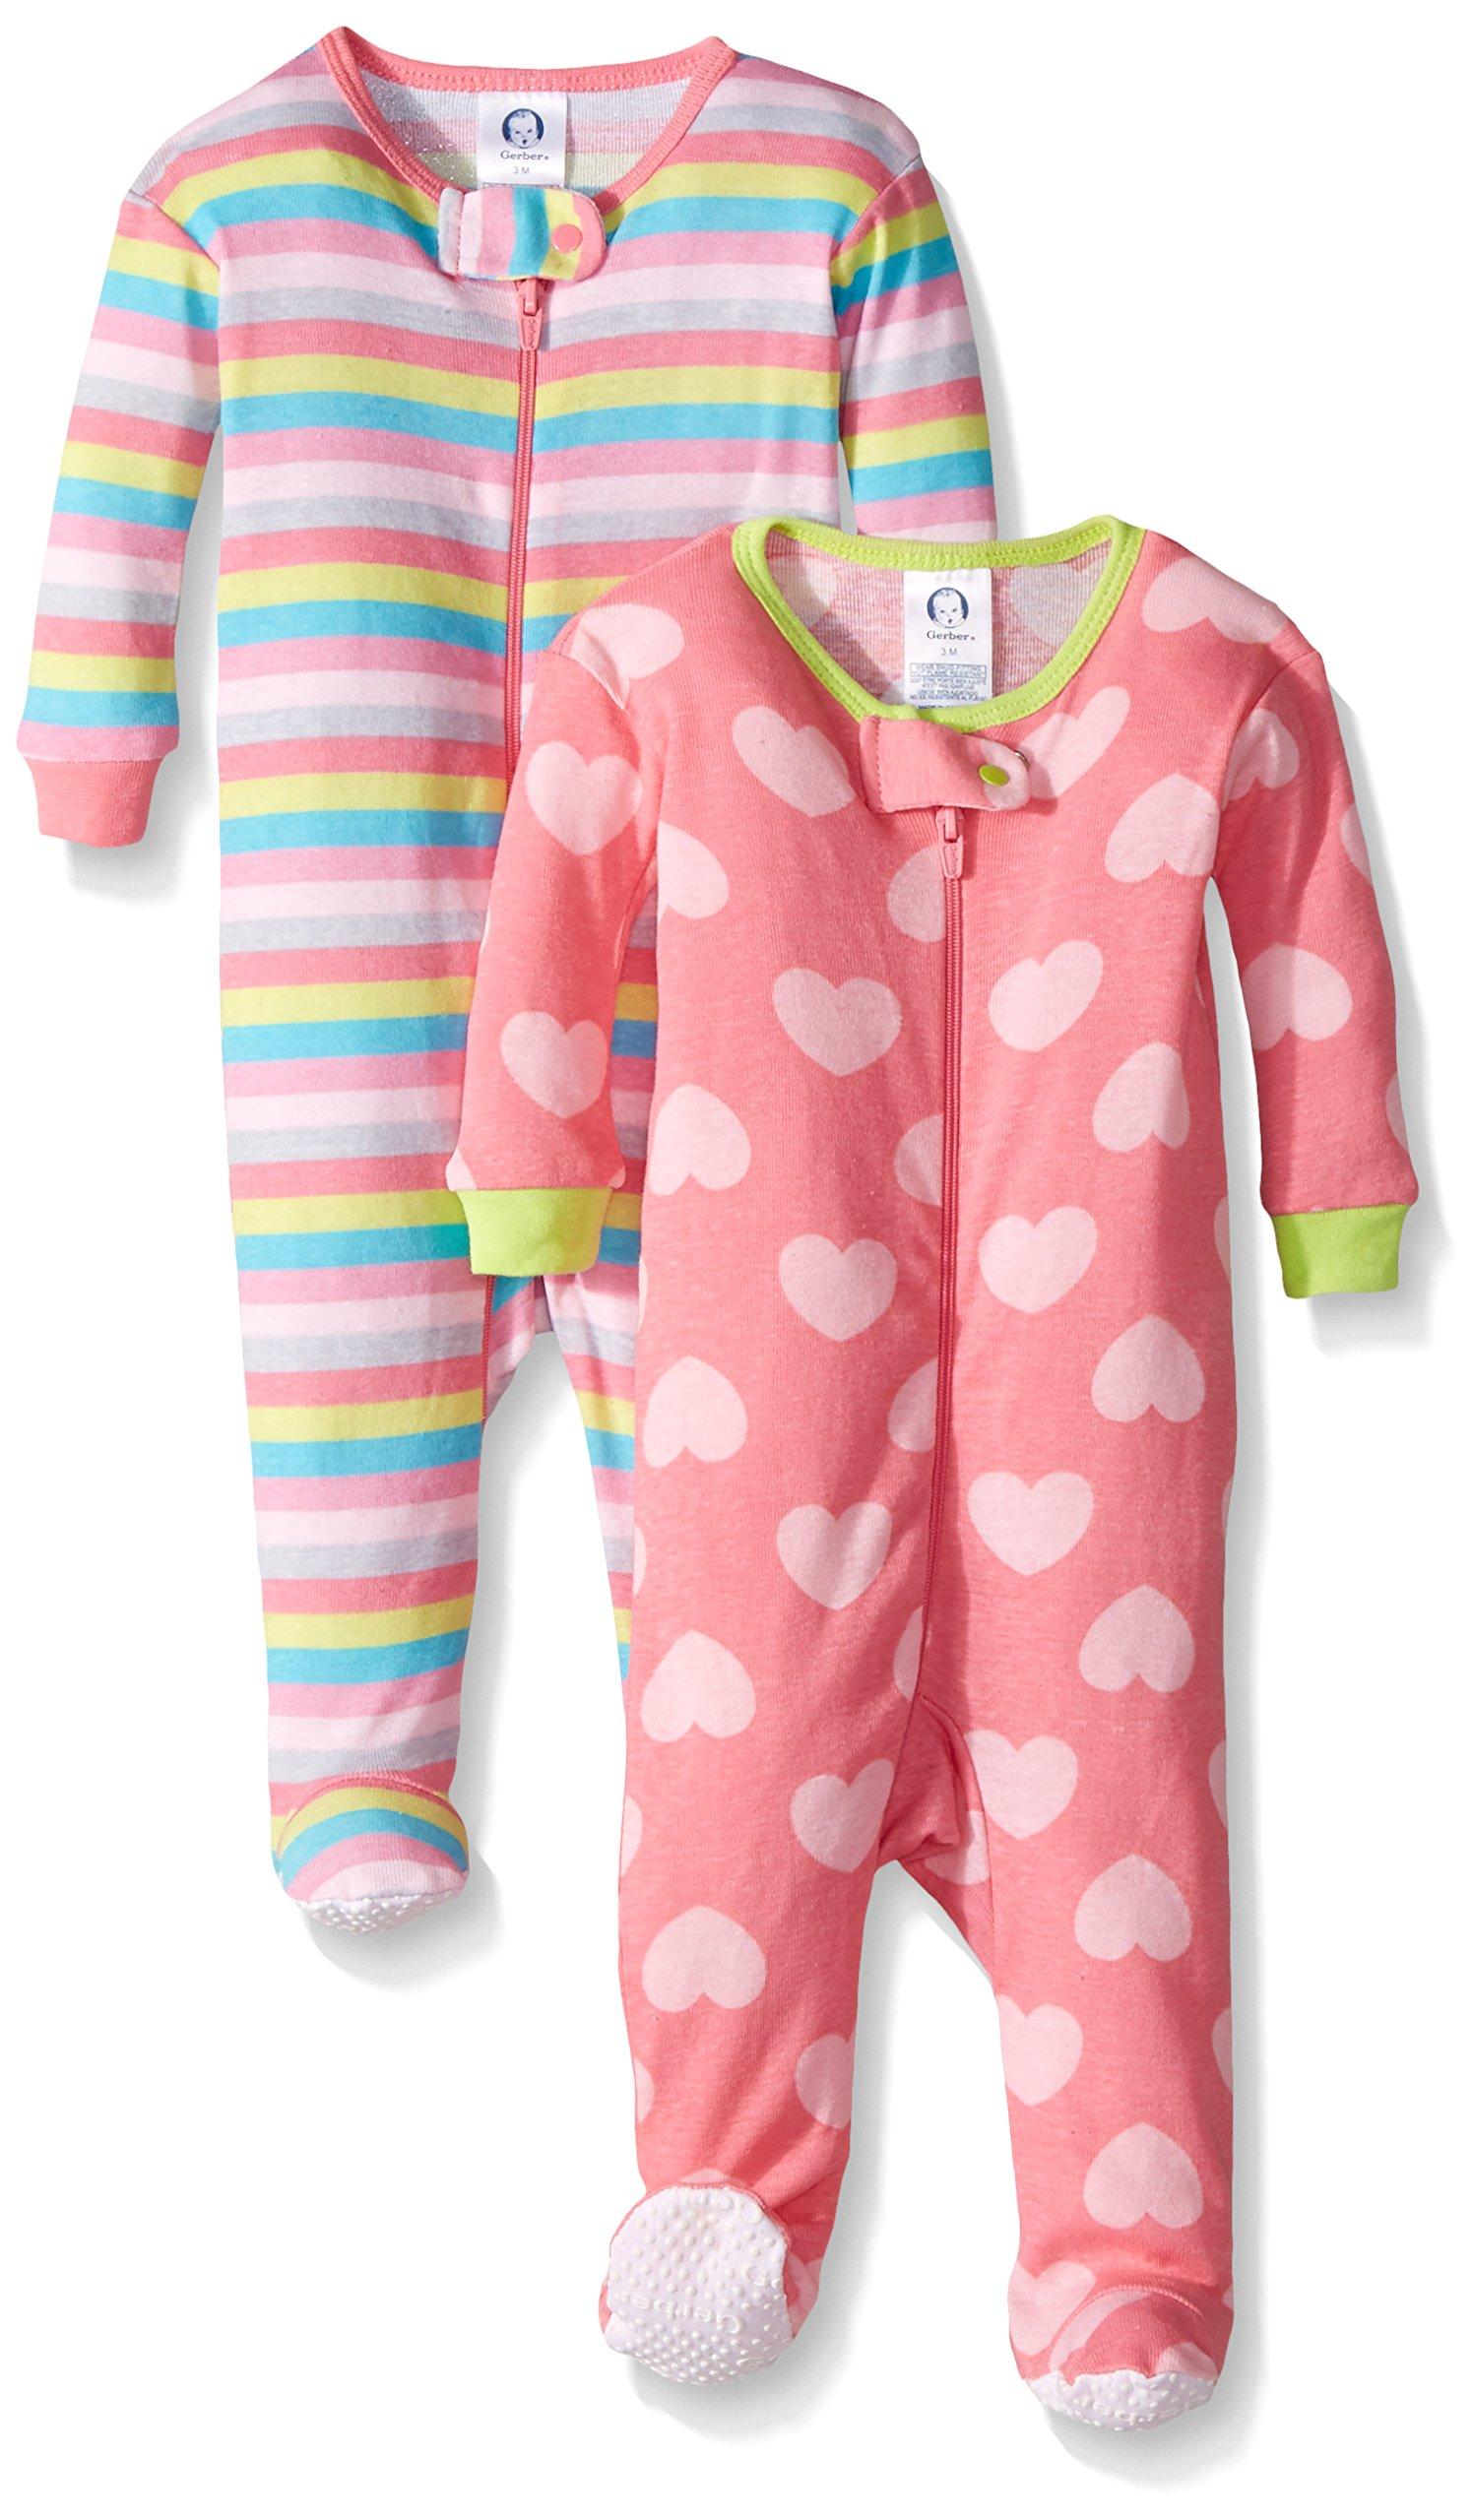 Gerber Baby Girls 2 Pack Footed Sleeper b6f4fa0c6